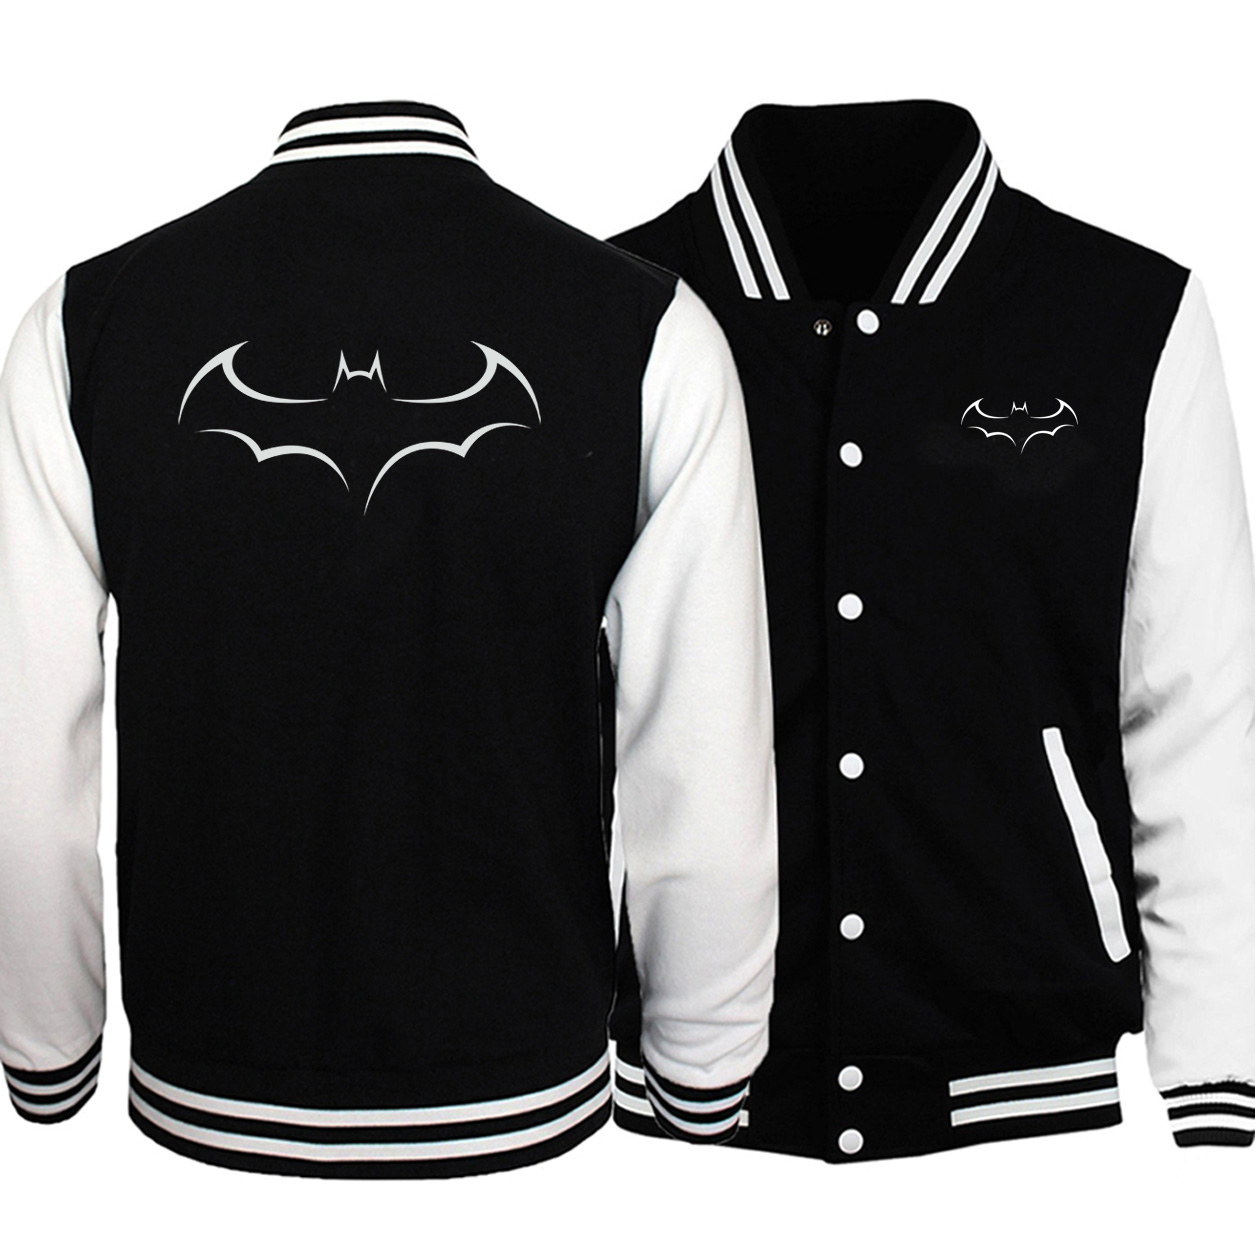 Fashion Batman Double-side Print Baseball Jackets Men Uniform Big Size Fleece Sweatshirt 2020 Fall Winter Long-sleeved Jackets